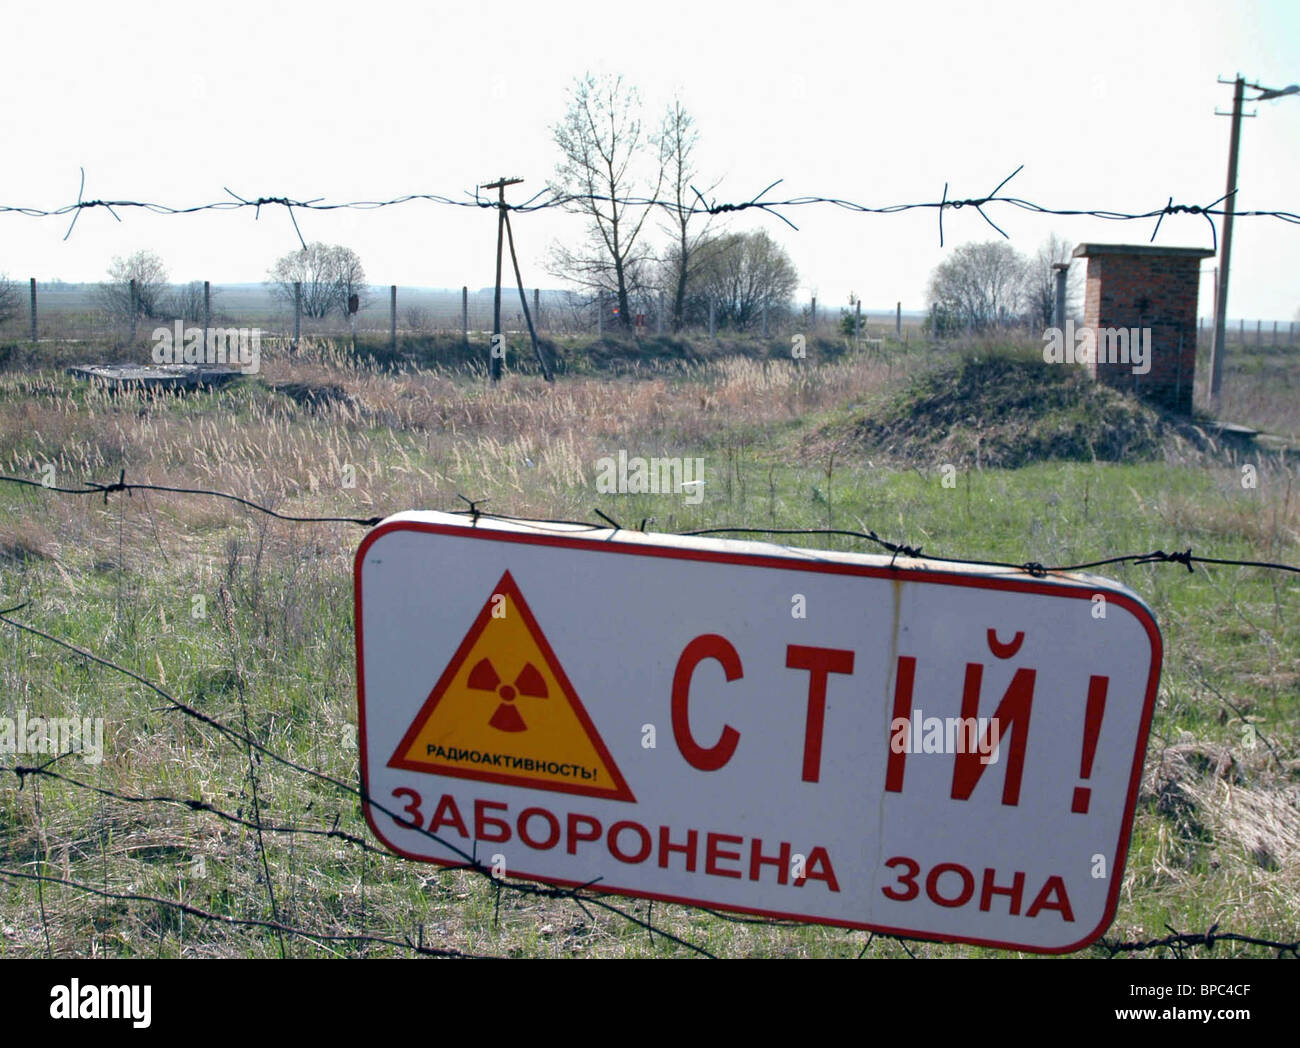 Chernobyl 20th anniversary commemorations begin - Stock Image